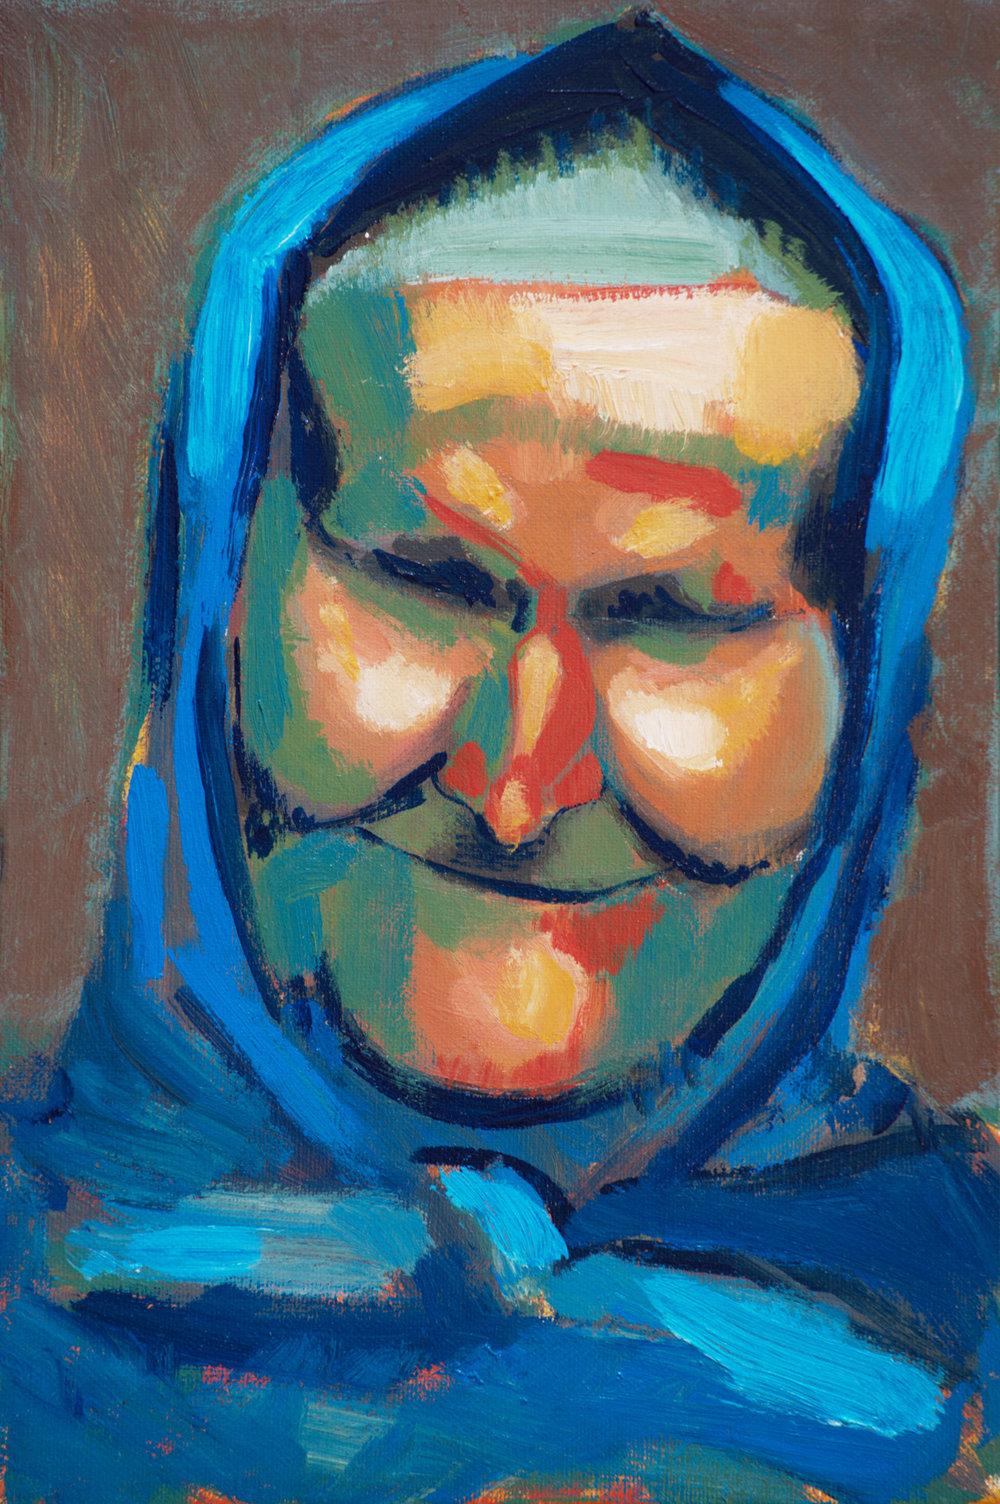 1996_portrait_20x30cm_Mother.jpg